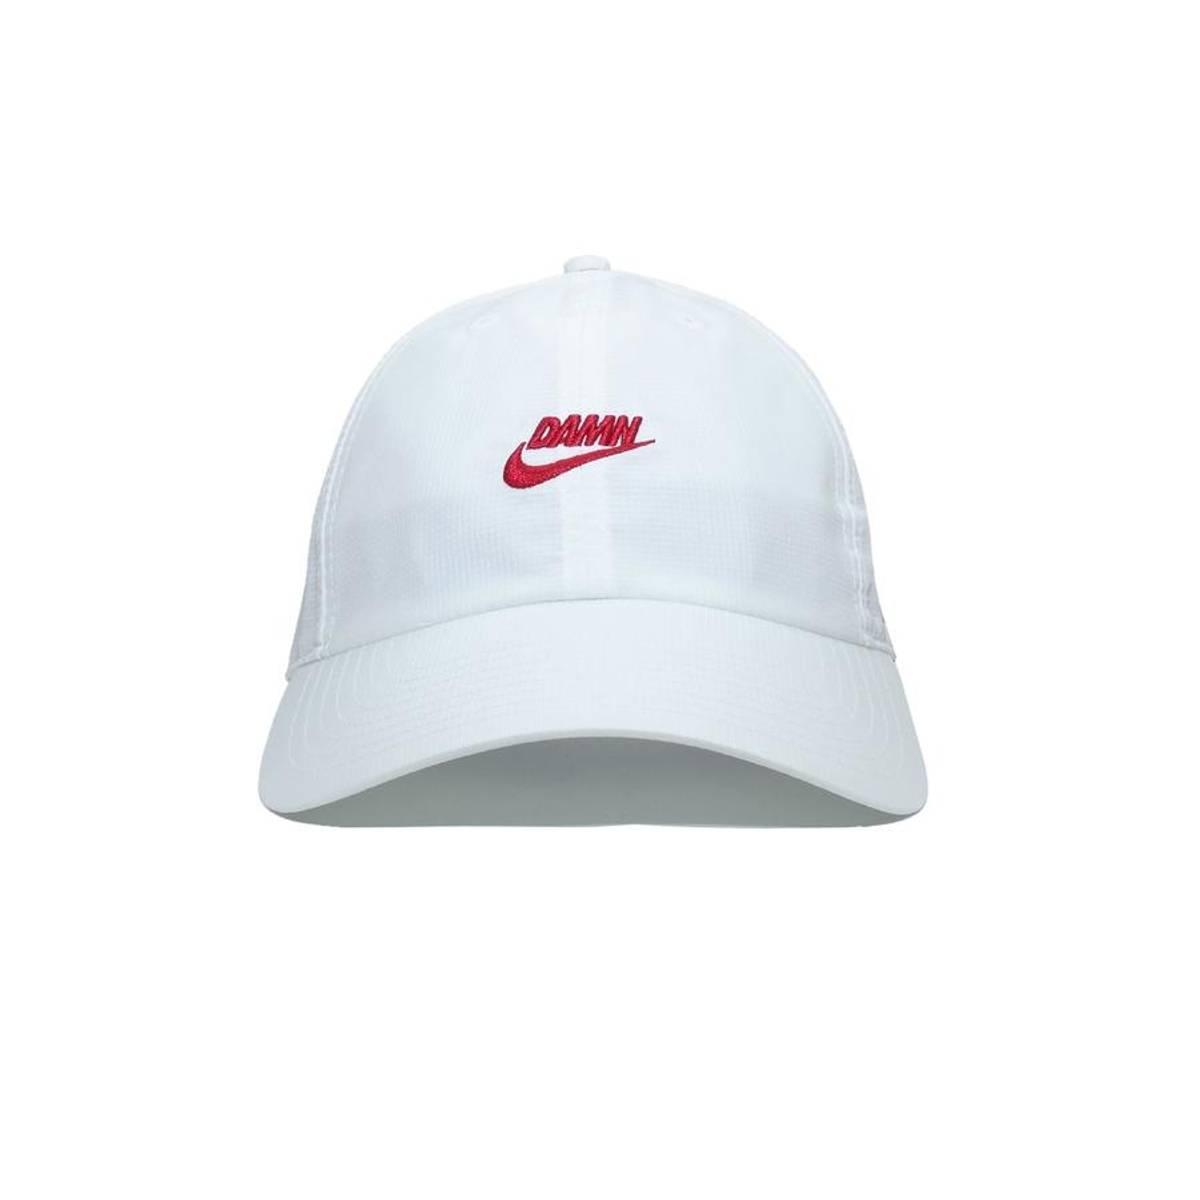 7bafcbfed63a7 Nike Nike X Kendrick Lamar Damn Hat (white)